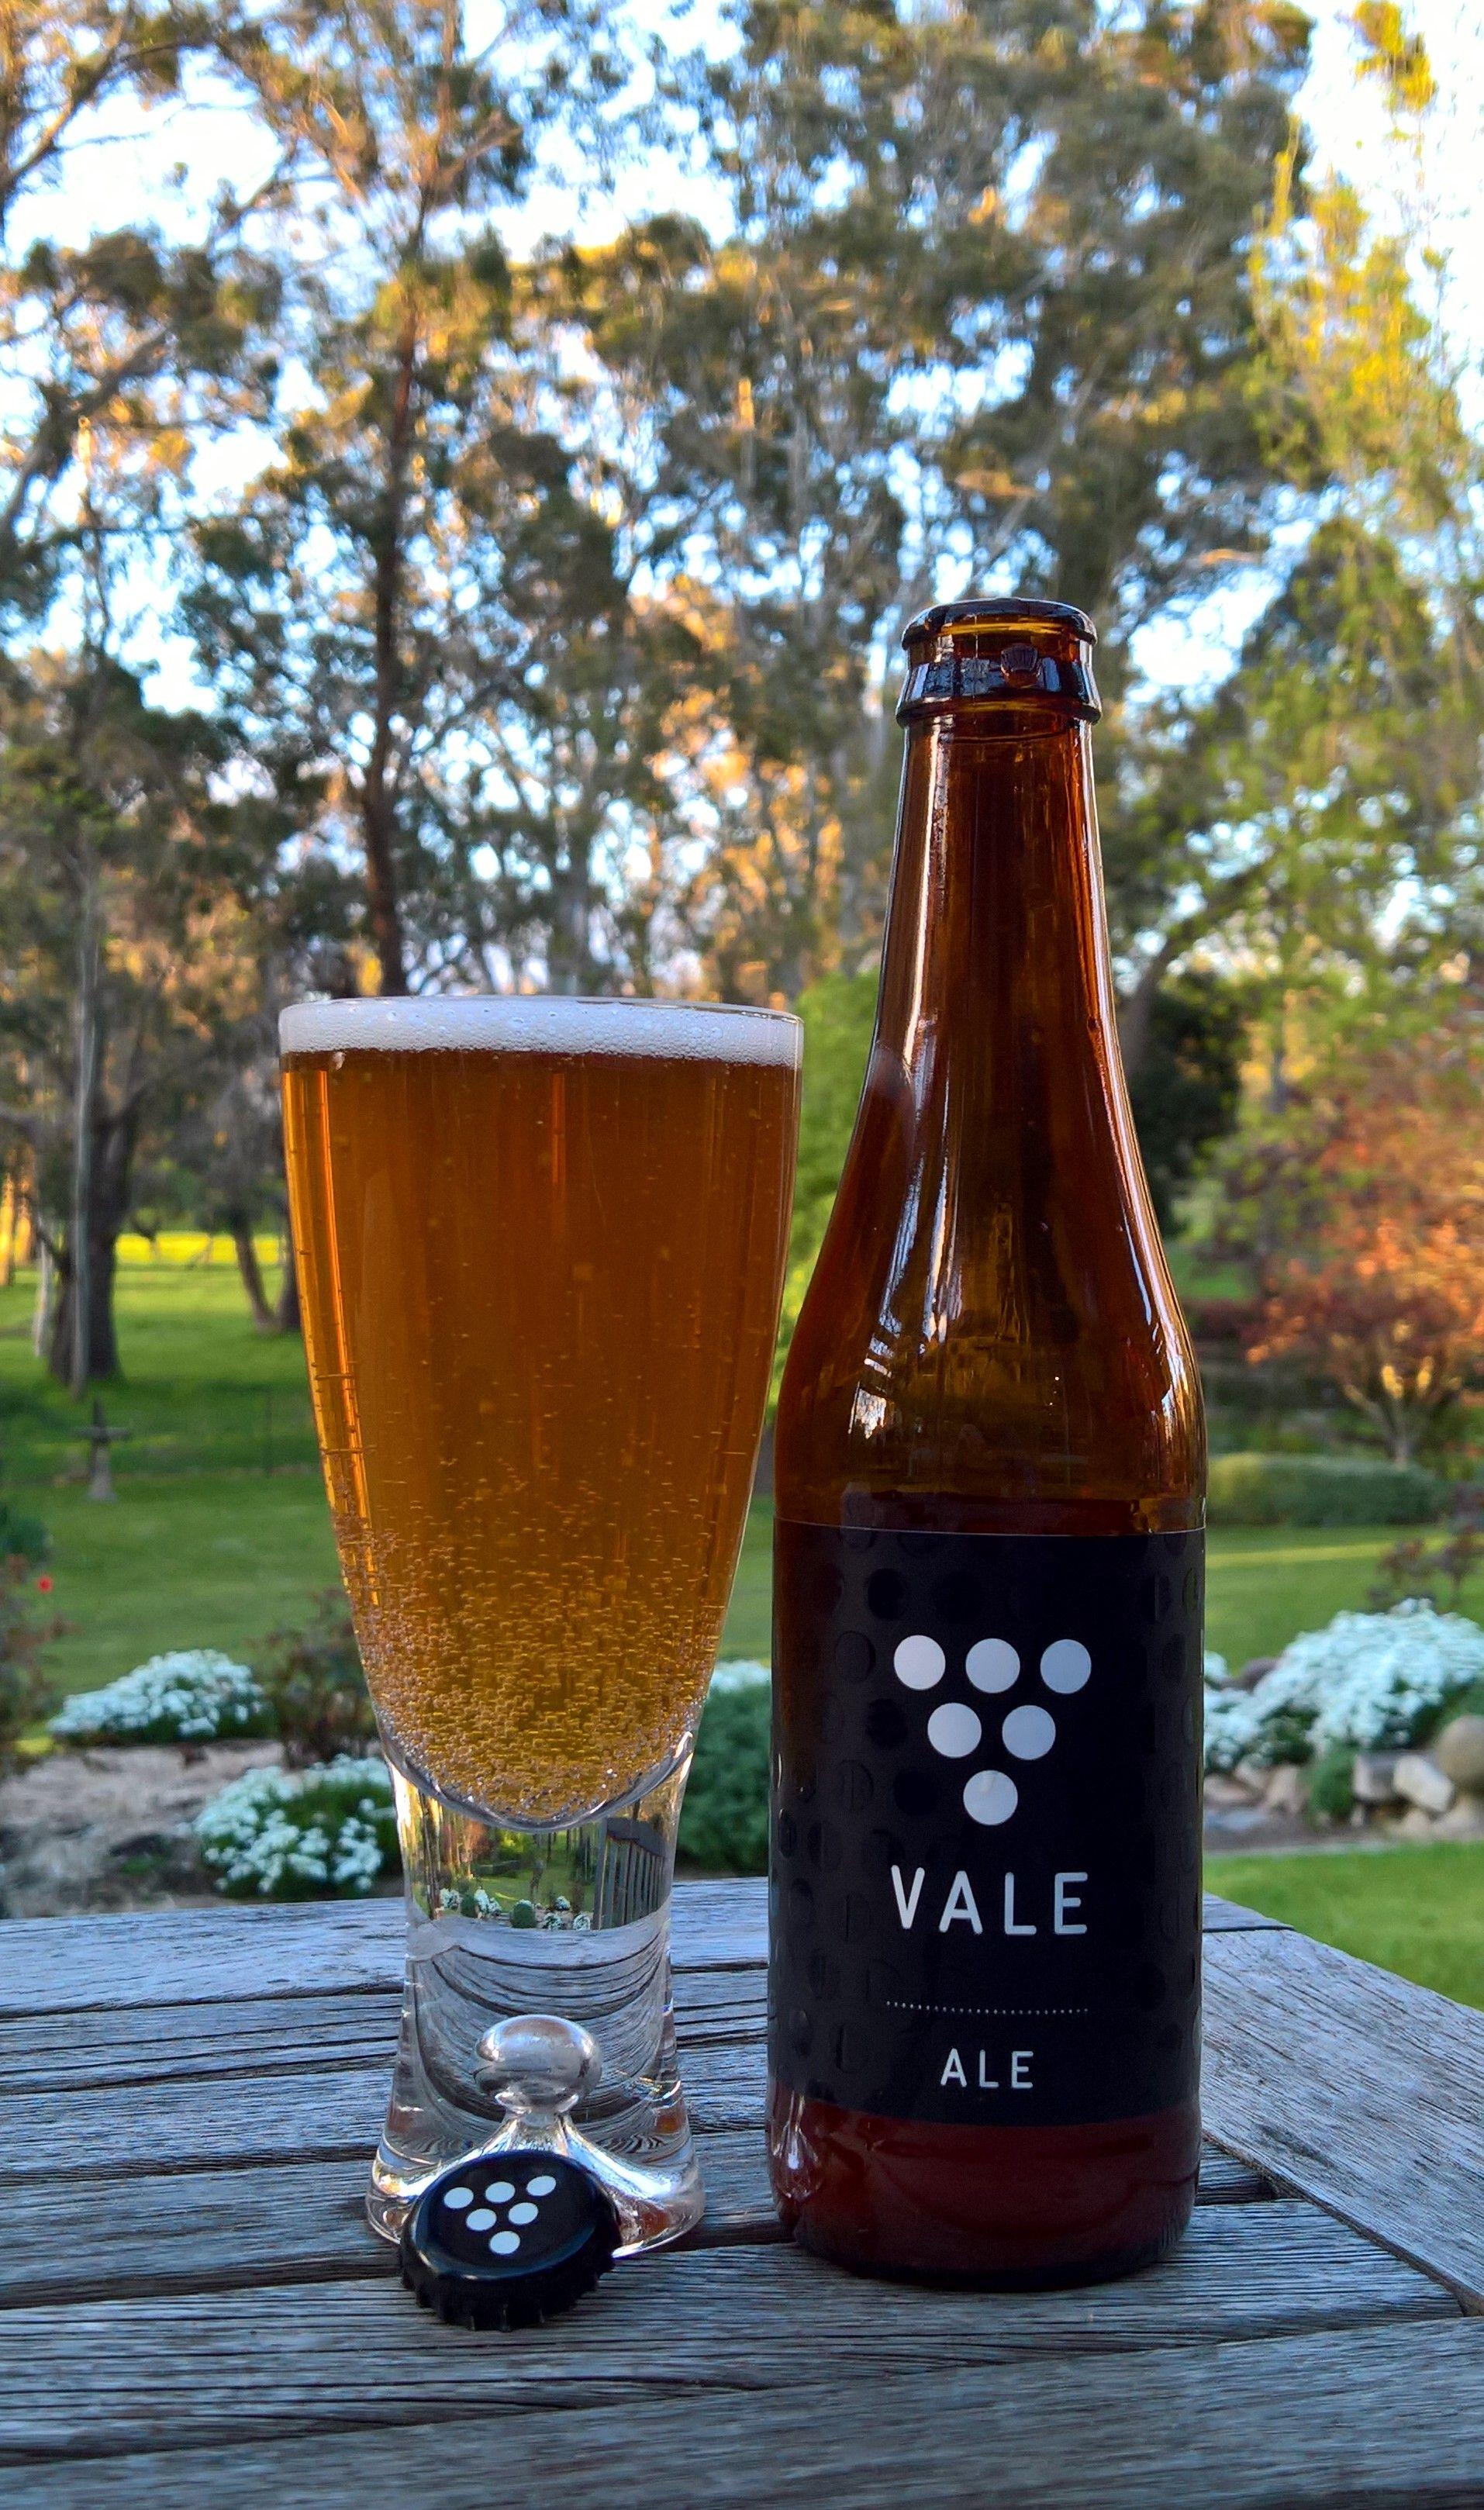 Vale Ale - from McLaren Vale, South Australia